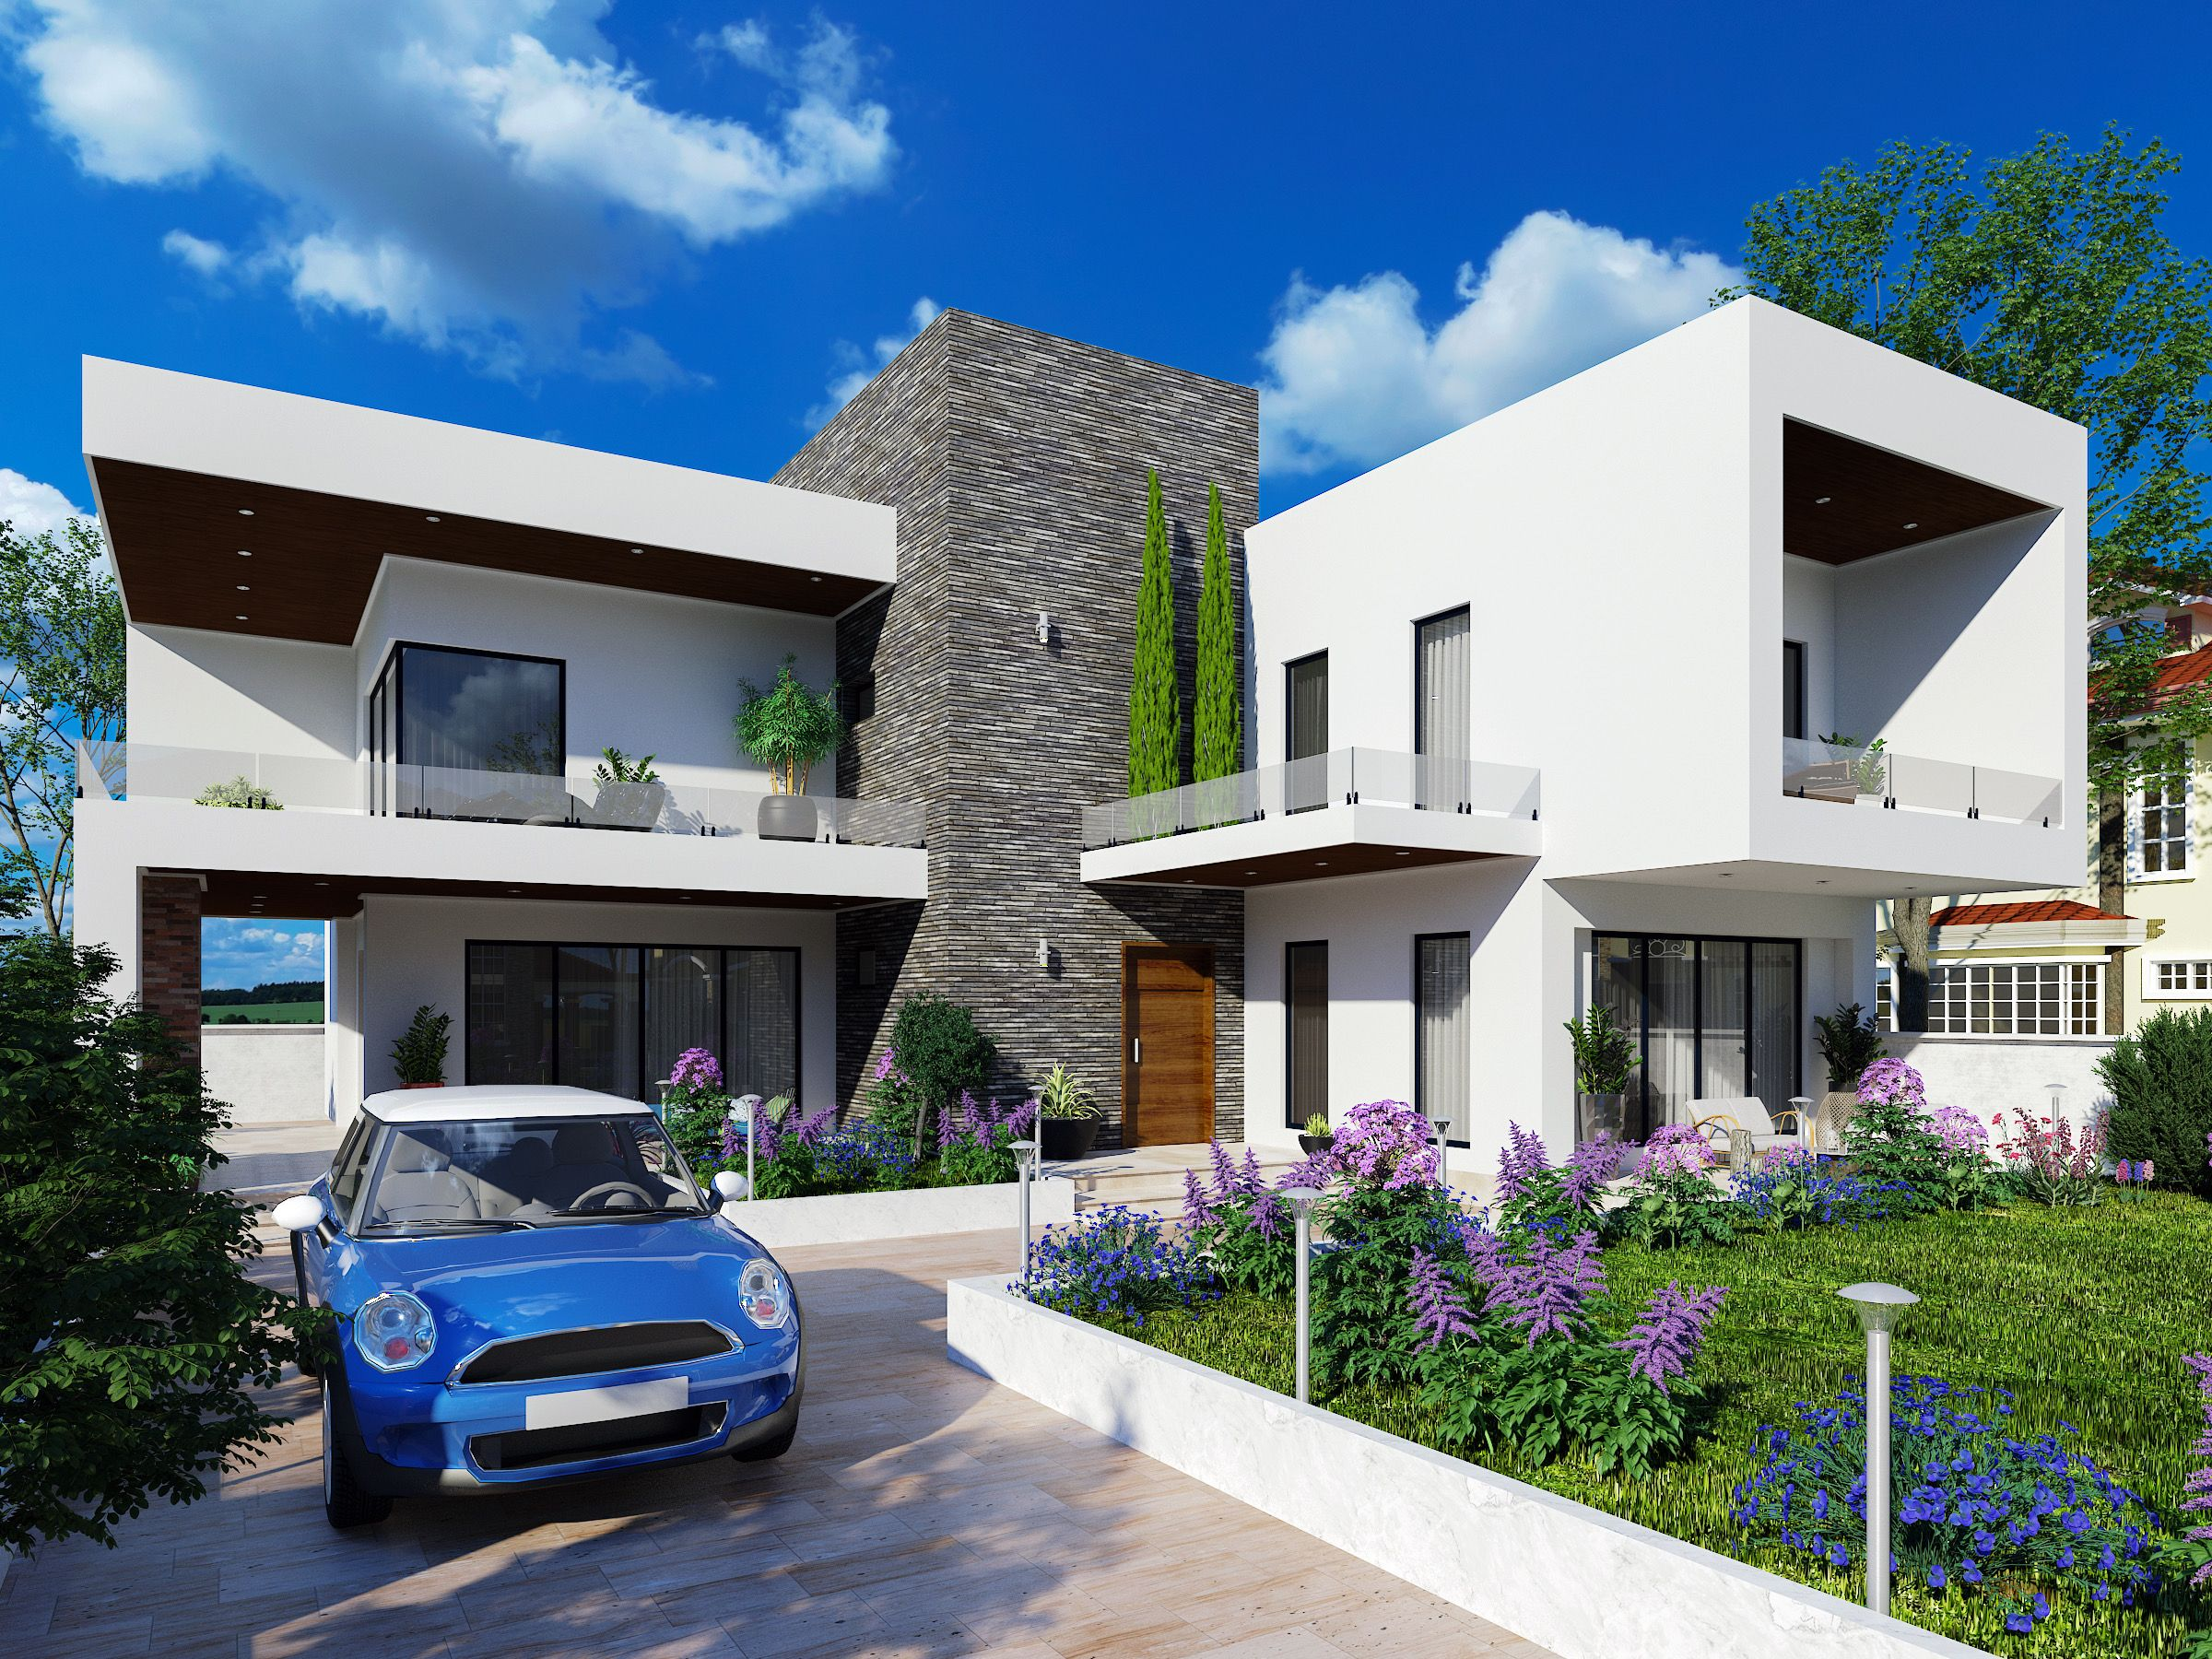 Modern House In 2020 House Styles Modern House House